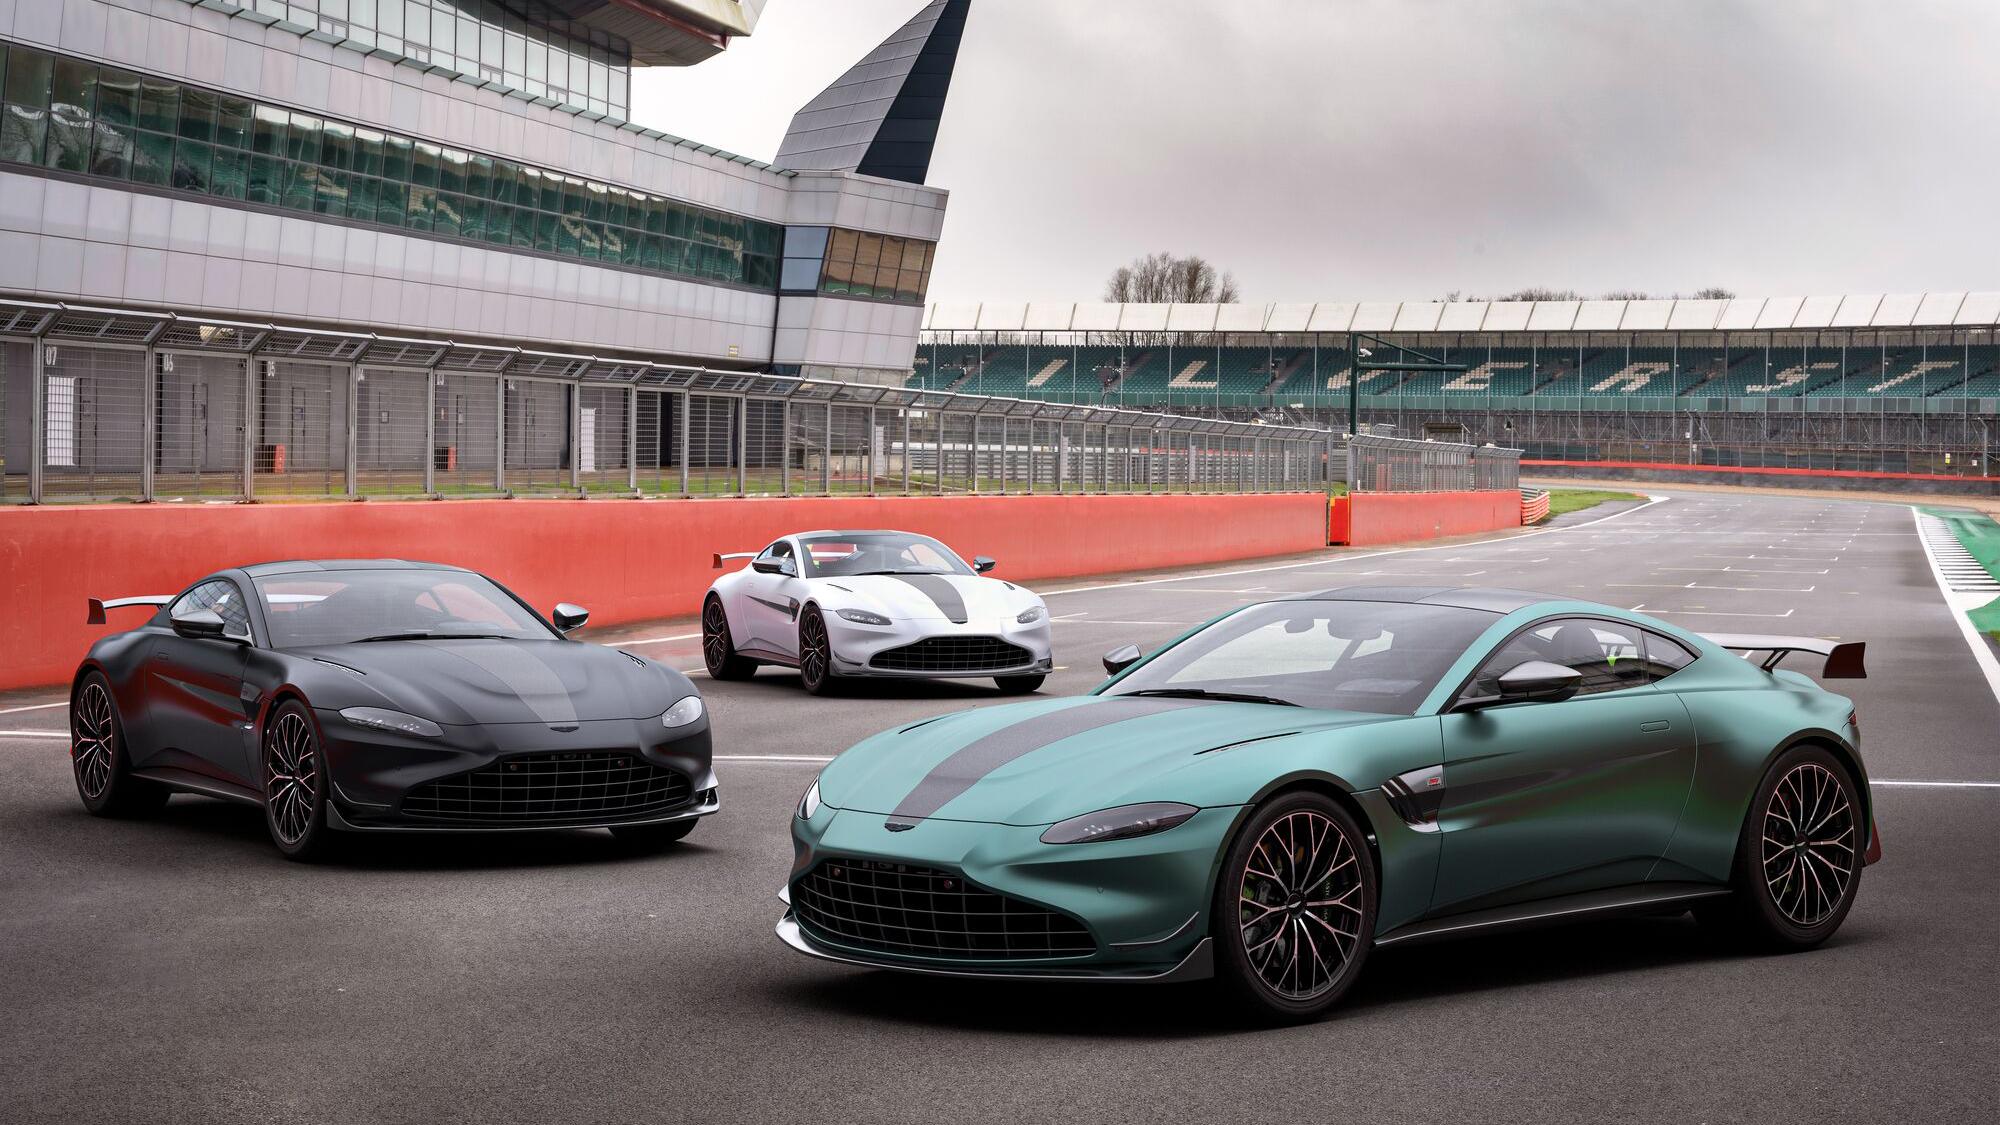 紀念回歸 F1,Aston Martin Vantage F1® Edition 售價 1088 萬起開放接單